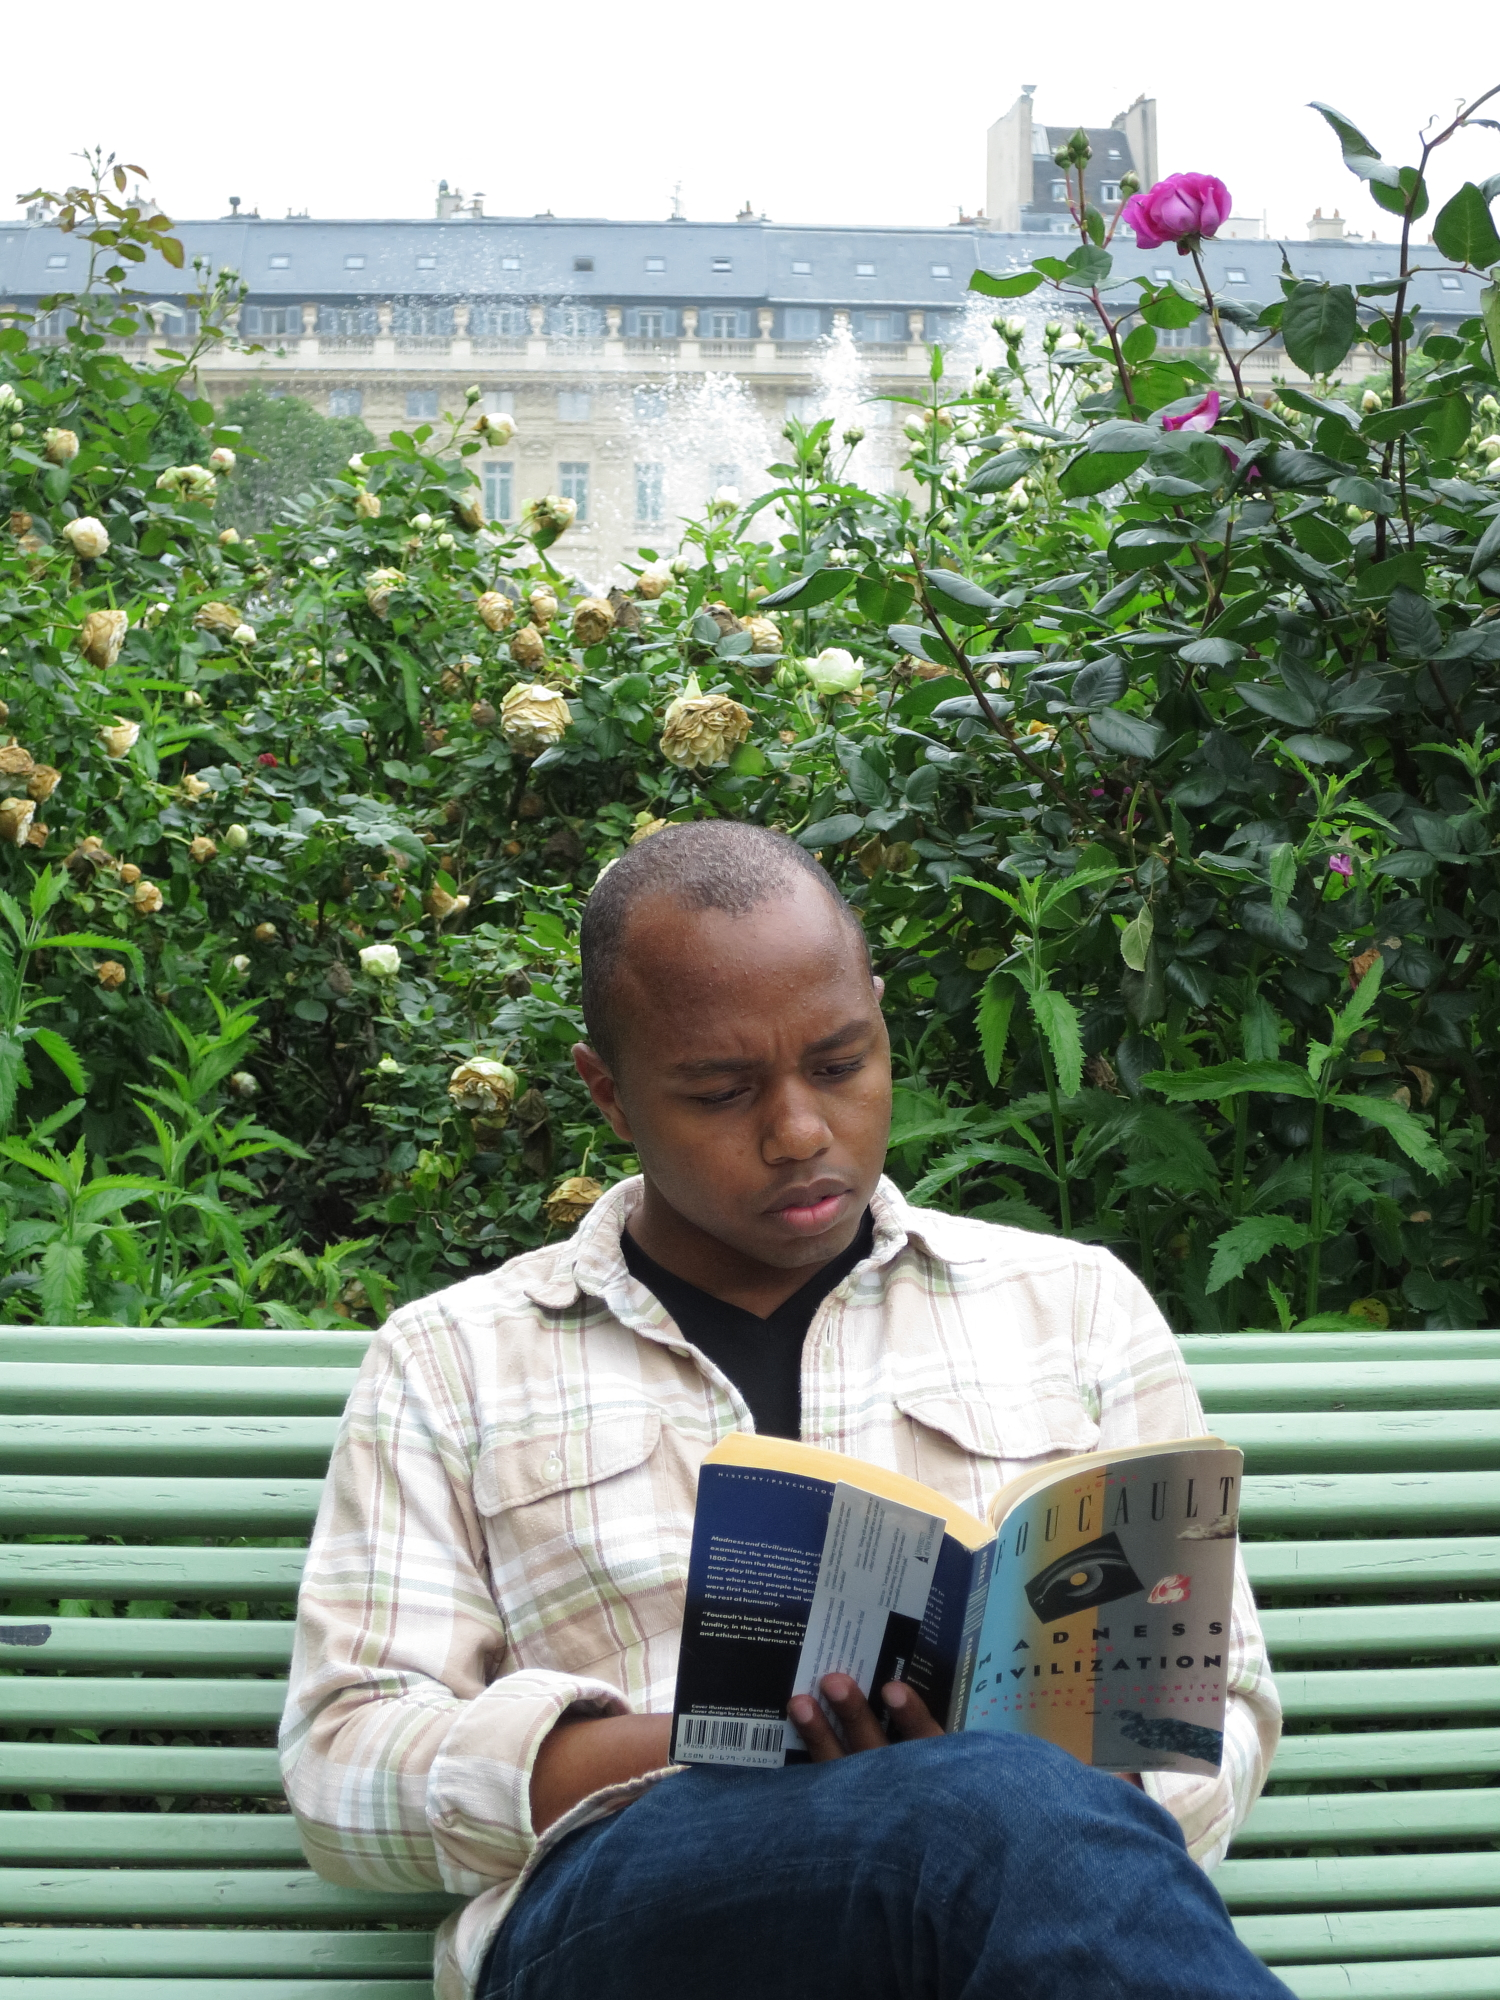 Sherard pretending to read Foucault in the garden of the Palais Royal